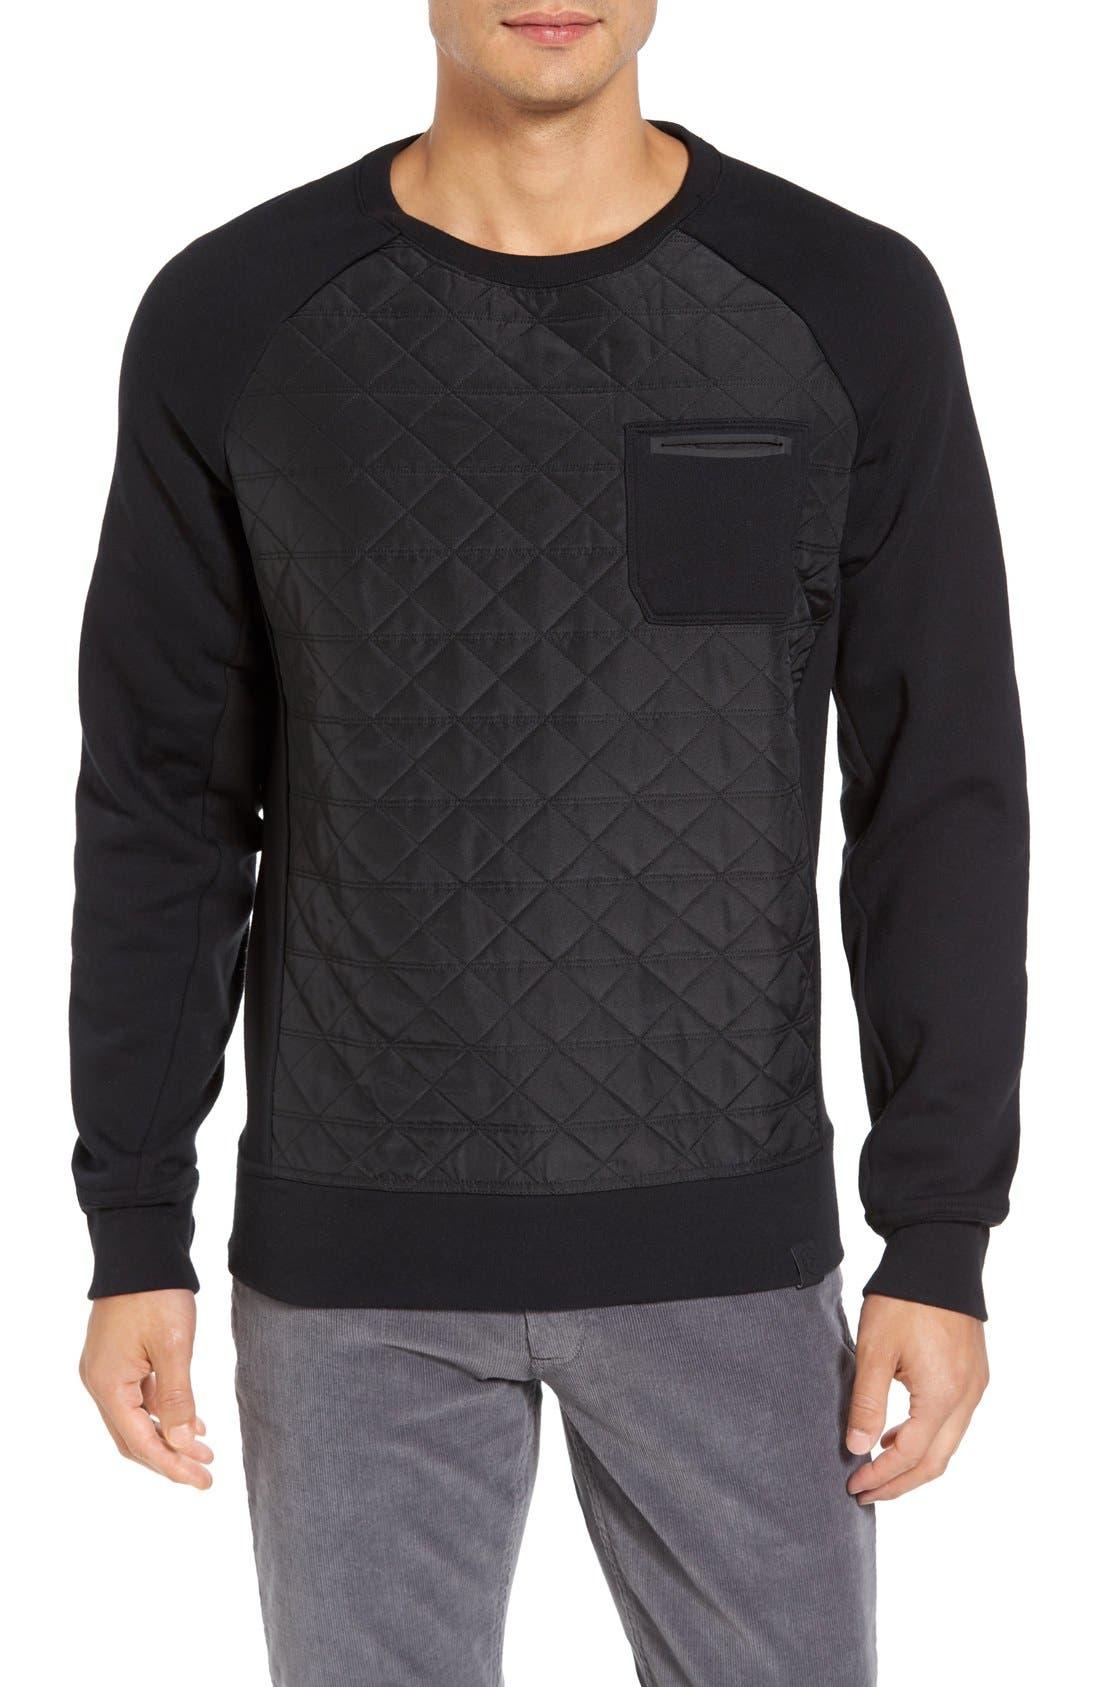 Victorinox Swiss Army® Stamper CVC Sweatshirt